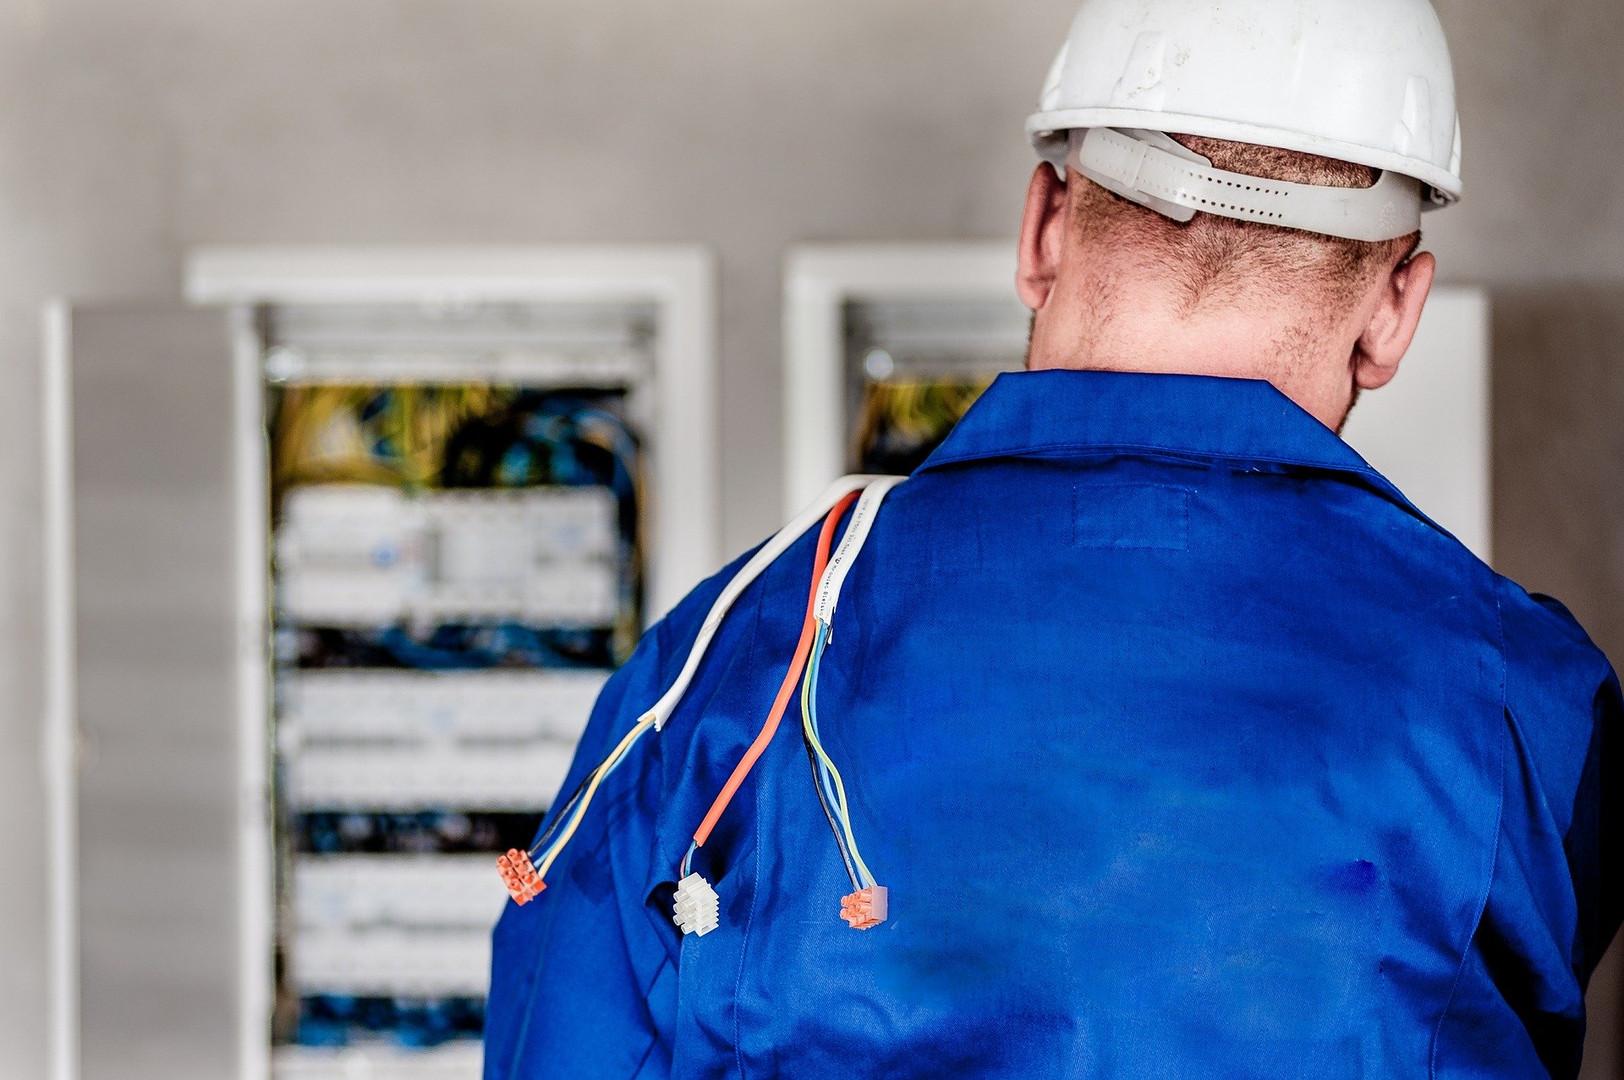 electrician-1080586_1920.jpg